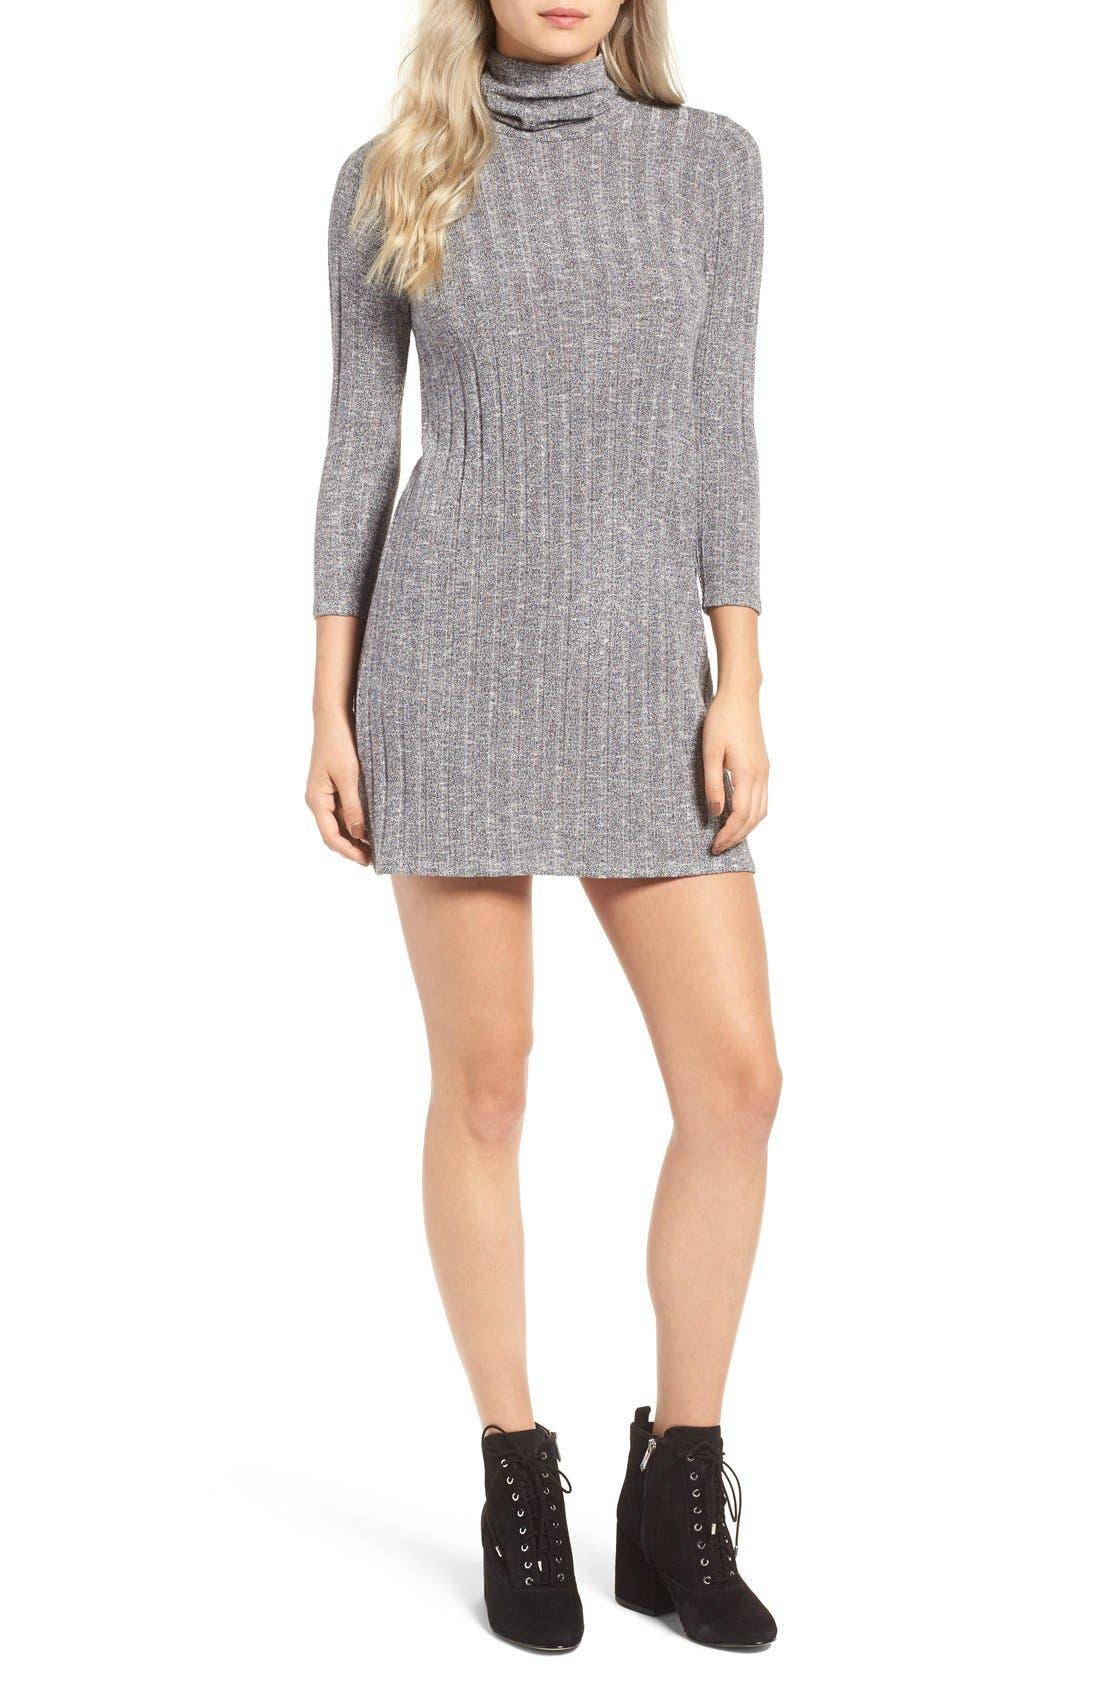 Alternate Image 1 Selected - O'Neill 'Jovana' Mock Neck Shift Dress